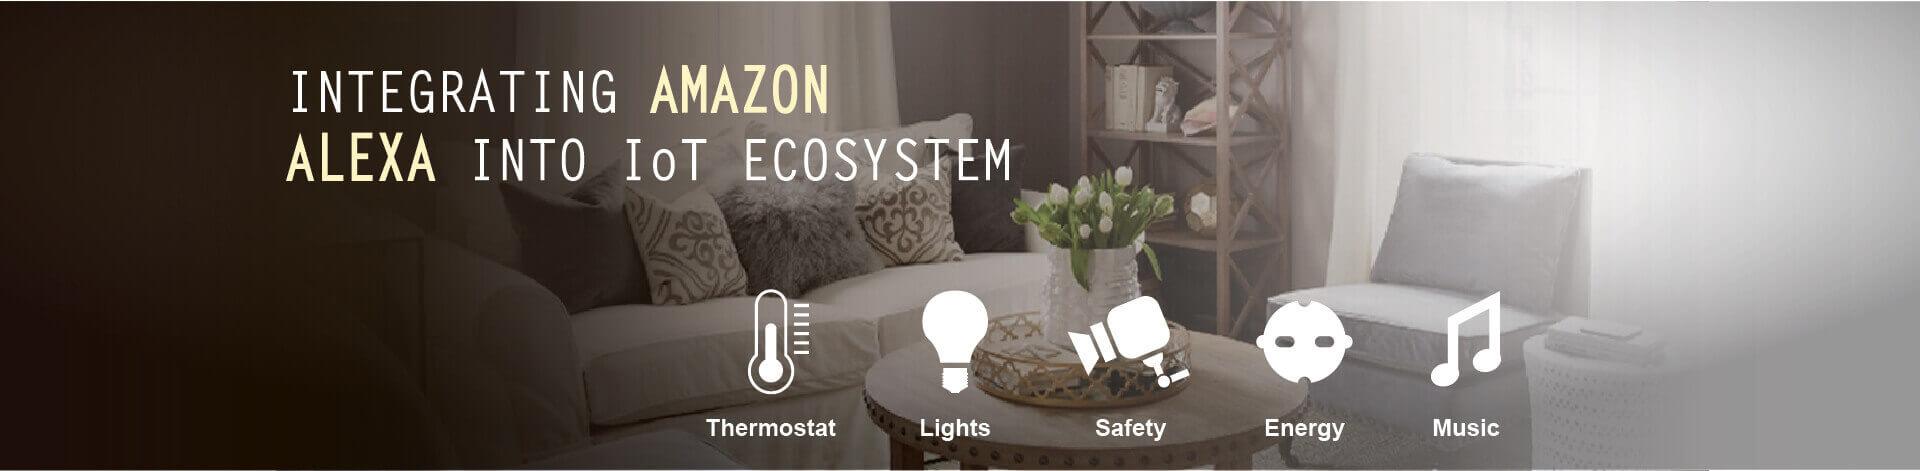 Integrating Amazon Alexa into IoT ecosystem